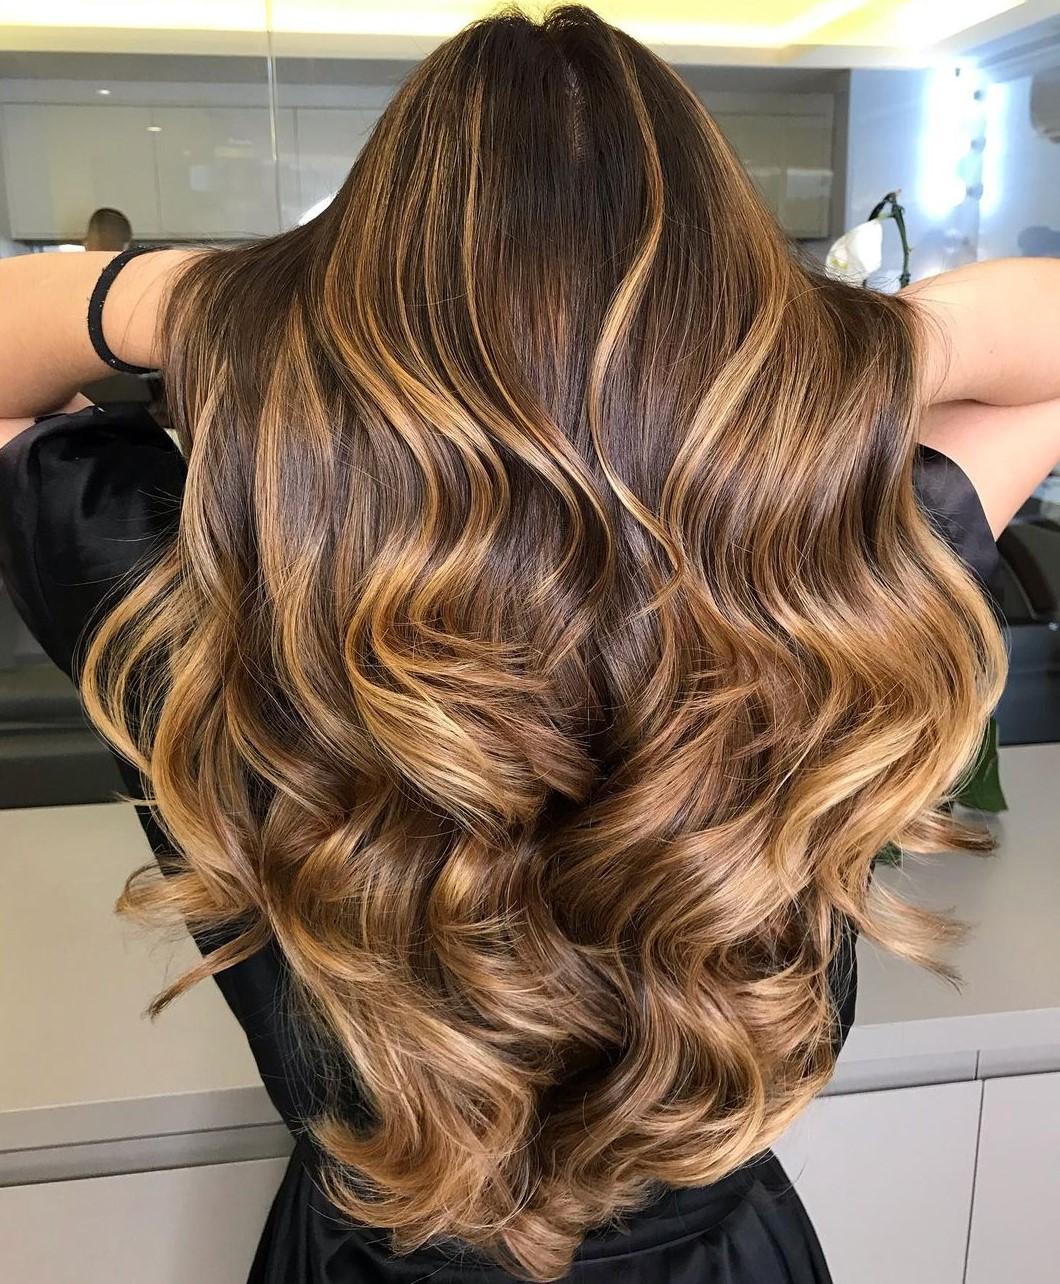 Sun-Kissed Honey Golden Brown Waves